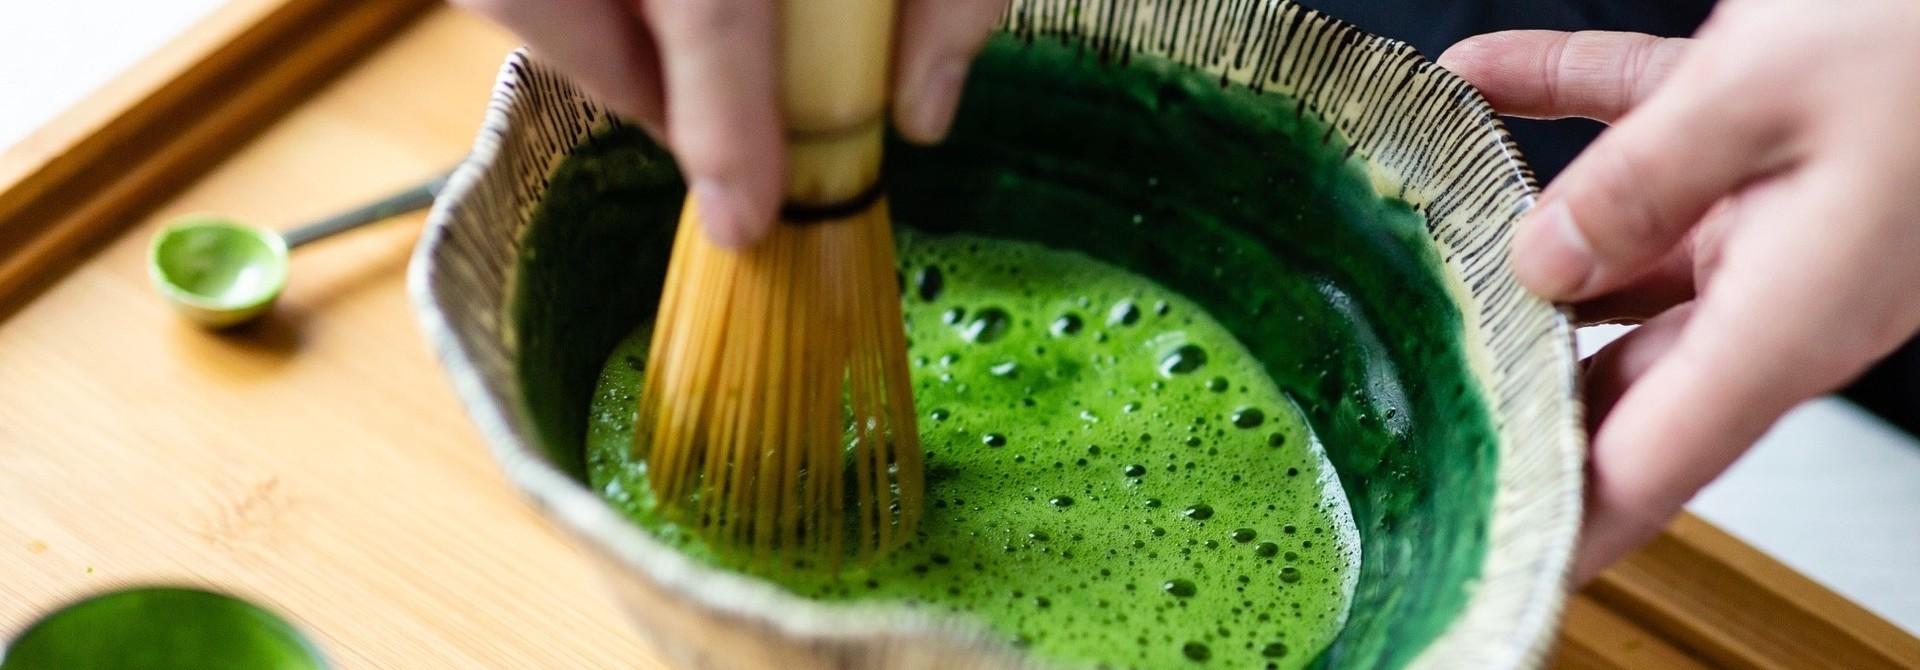 Matcha, Japanse groene poederthee uit Uji